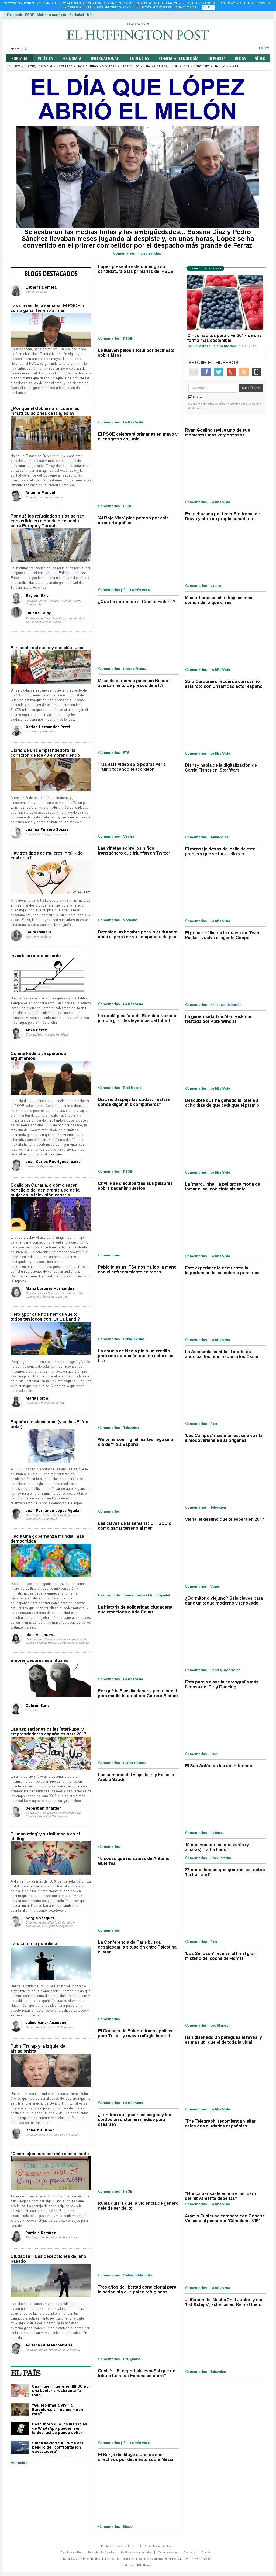 El Huffington Post (Spain) at Sunday Jan. 15, 2017, 7:05 a.m. UTC